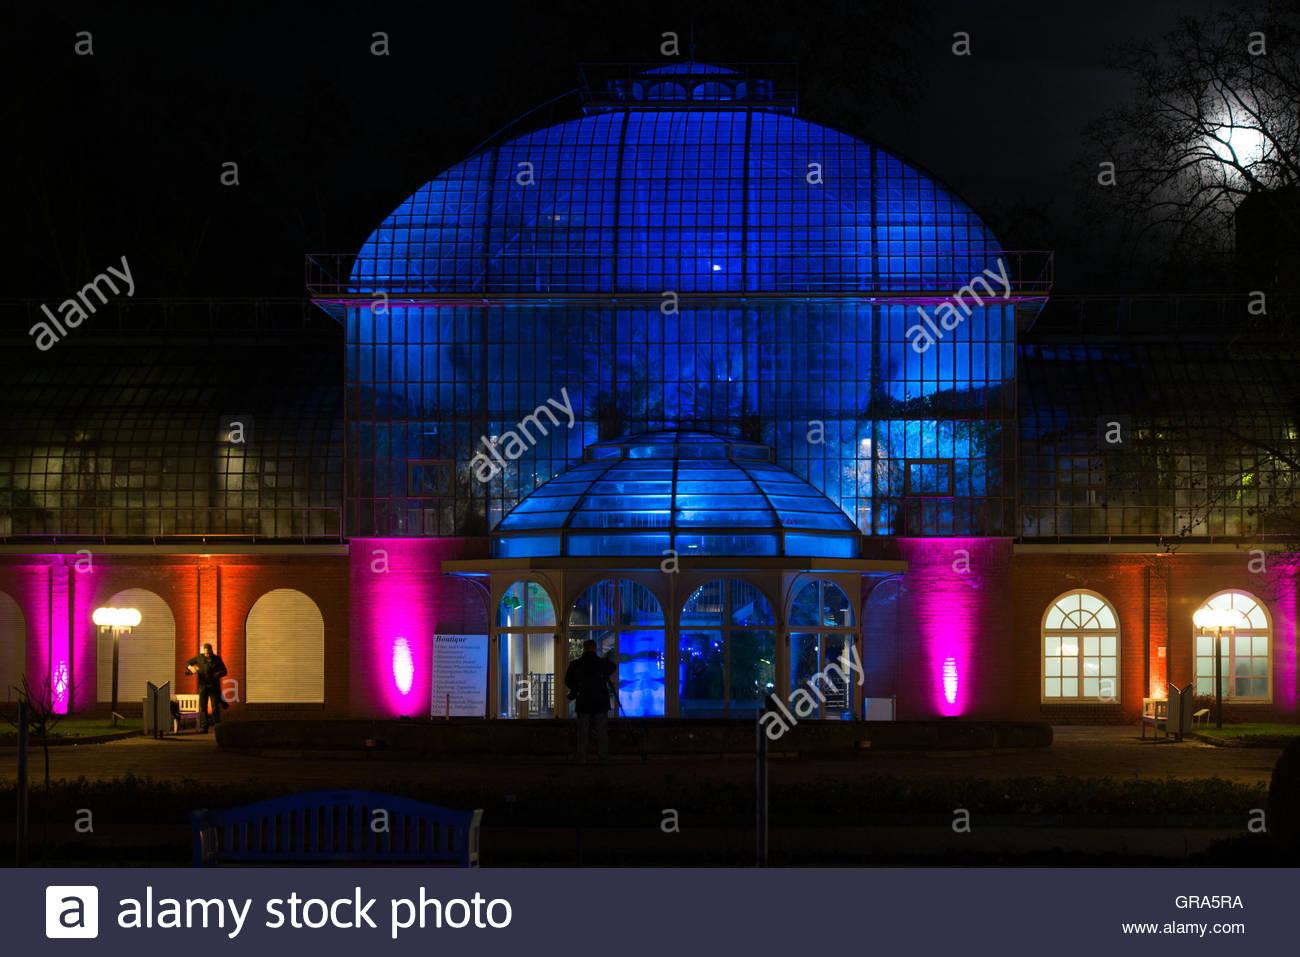 Illumination - Stock Image